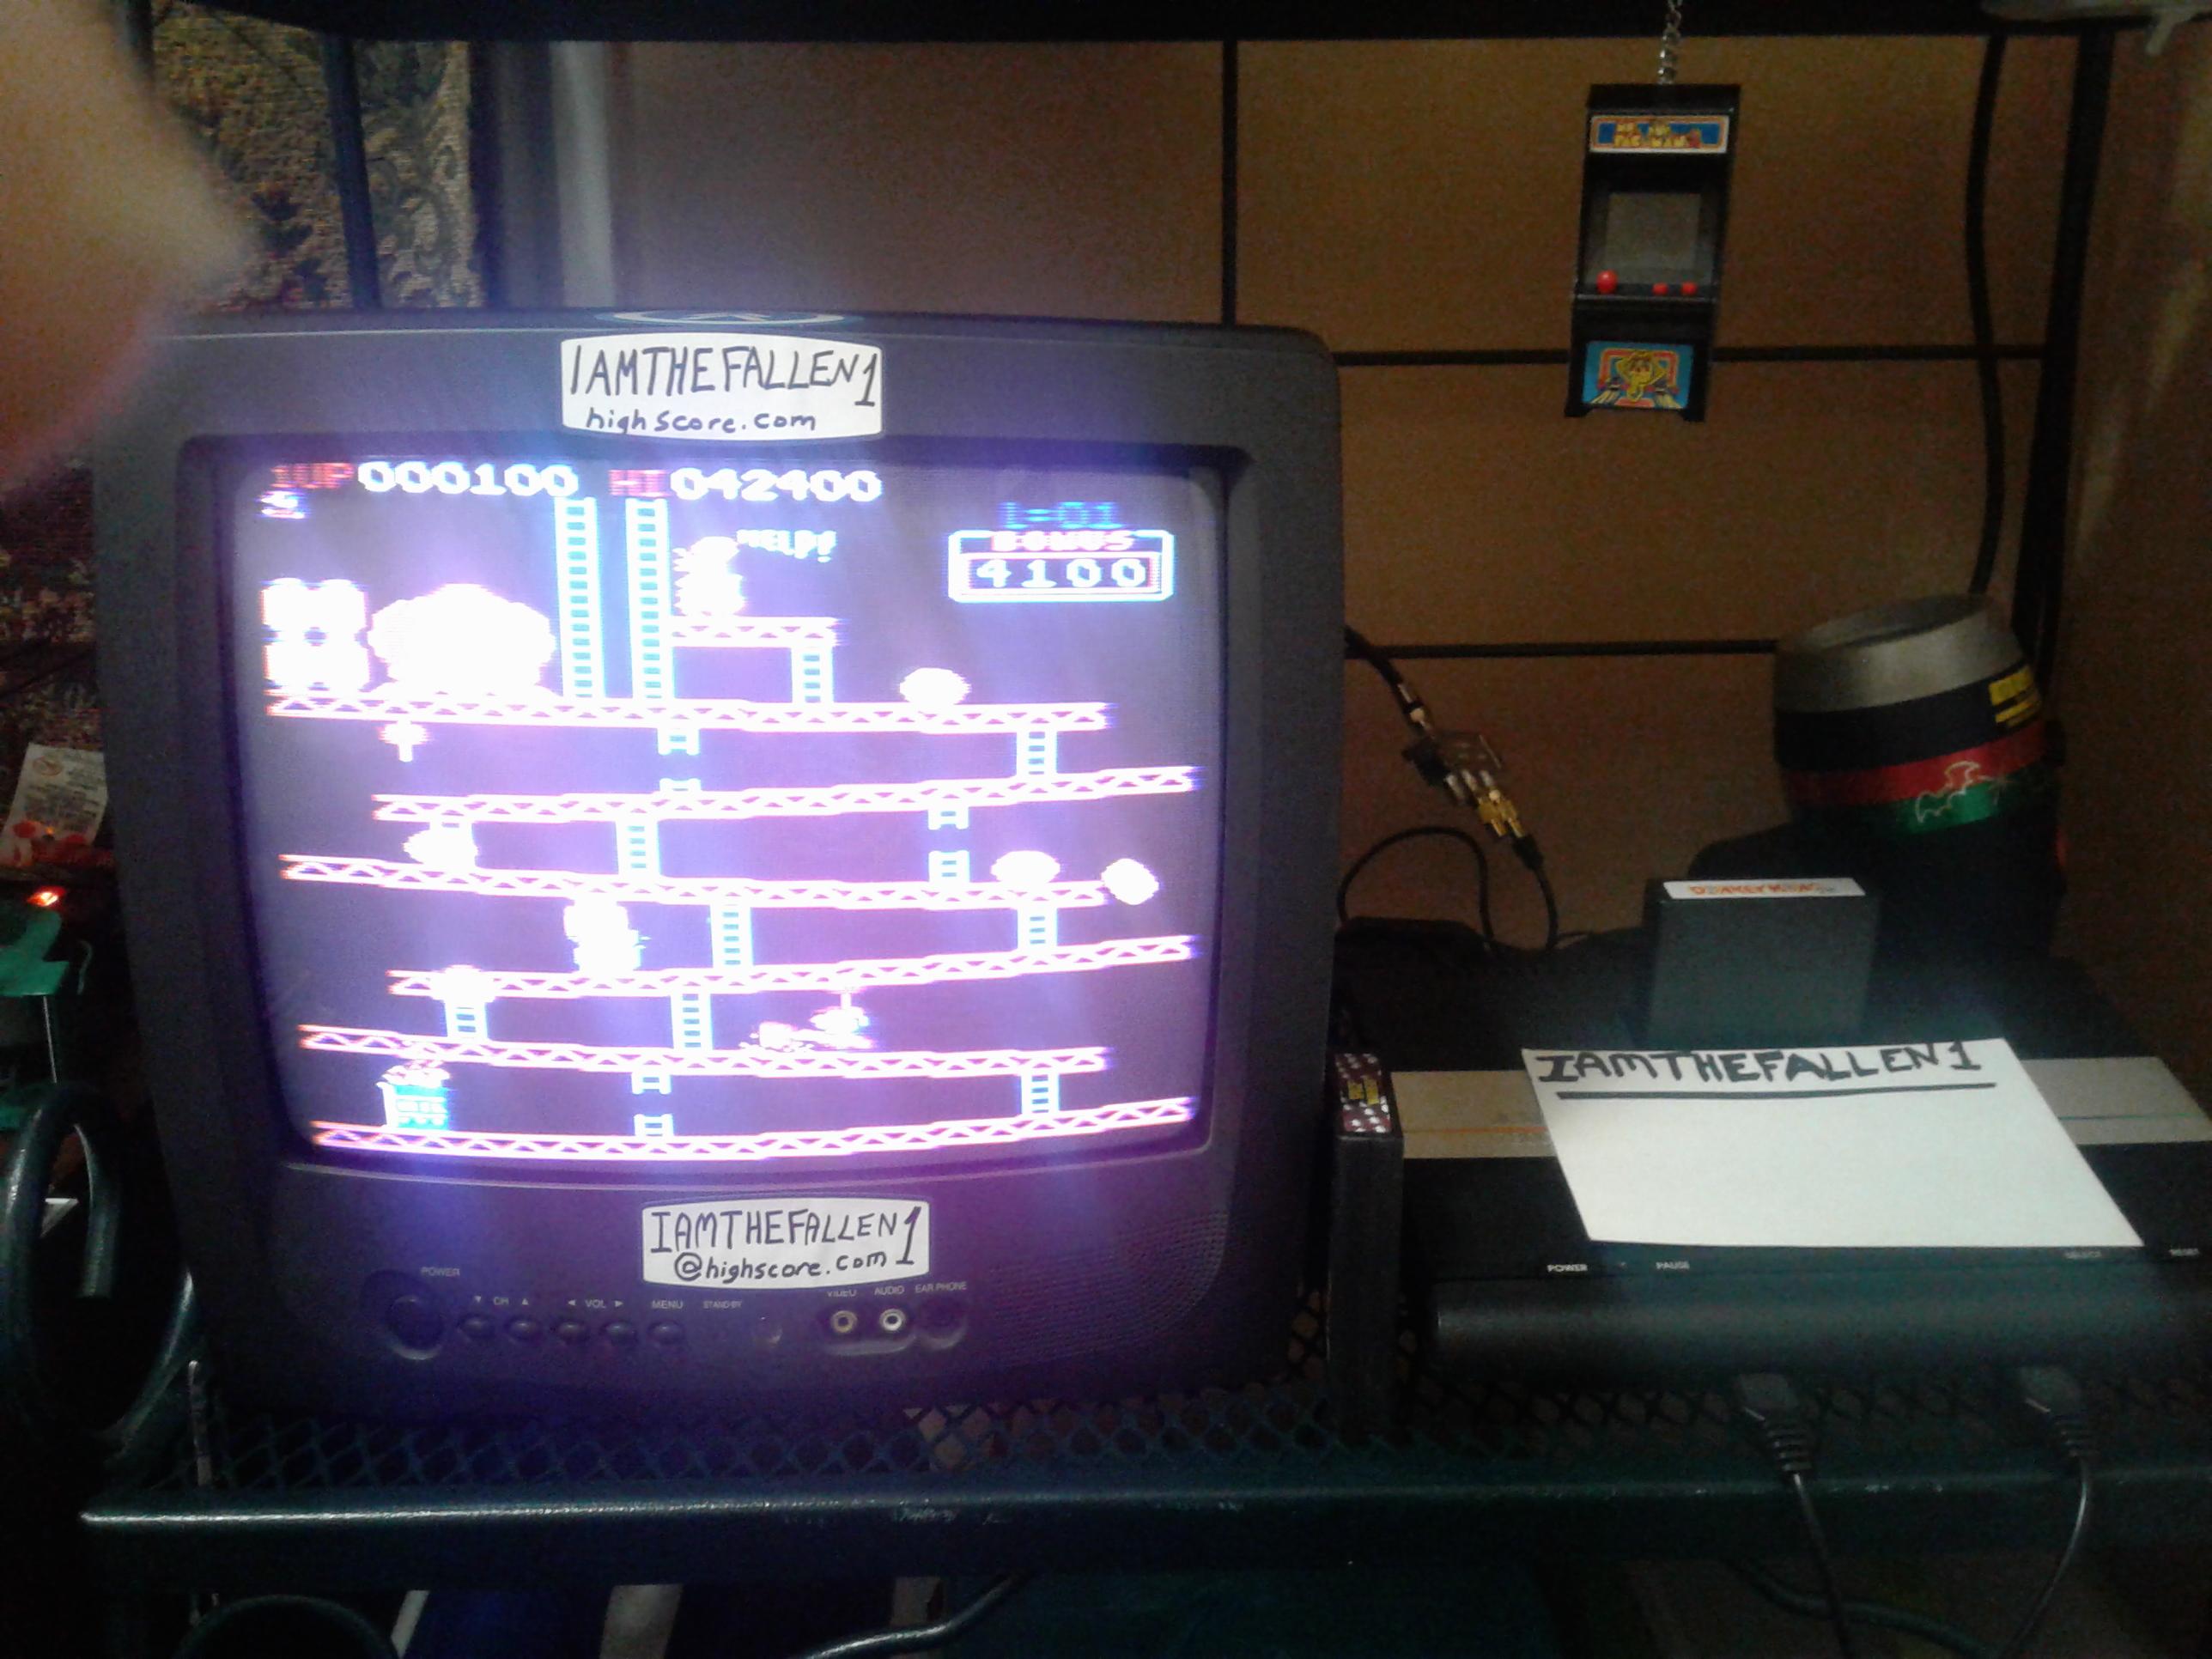 iamthefallen1: Donkey Kong PK [Arcade] [Japan Order] [Level 1 Start] (Atari 7800) 42,400 points on 2018-03-18 07:14:18